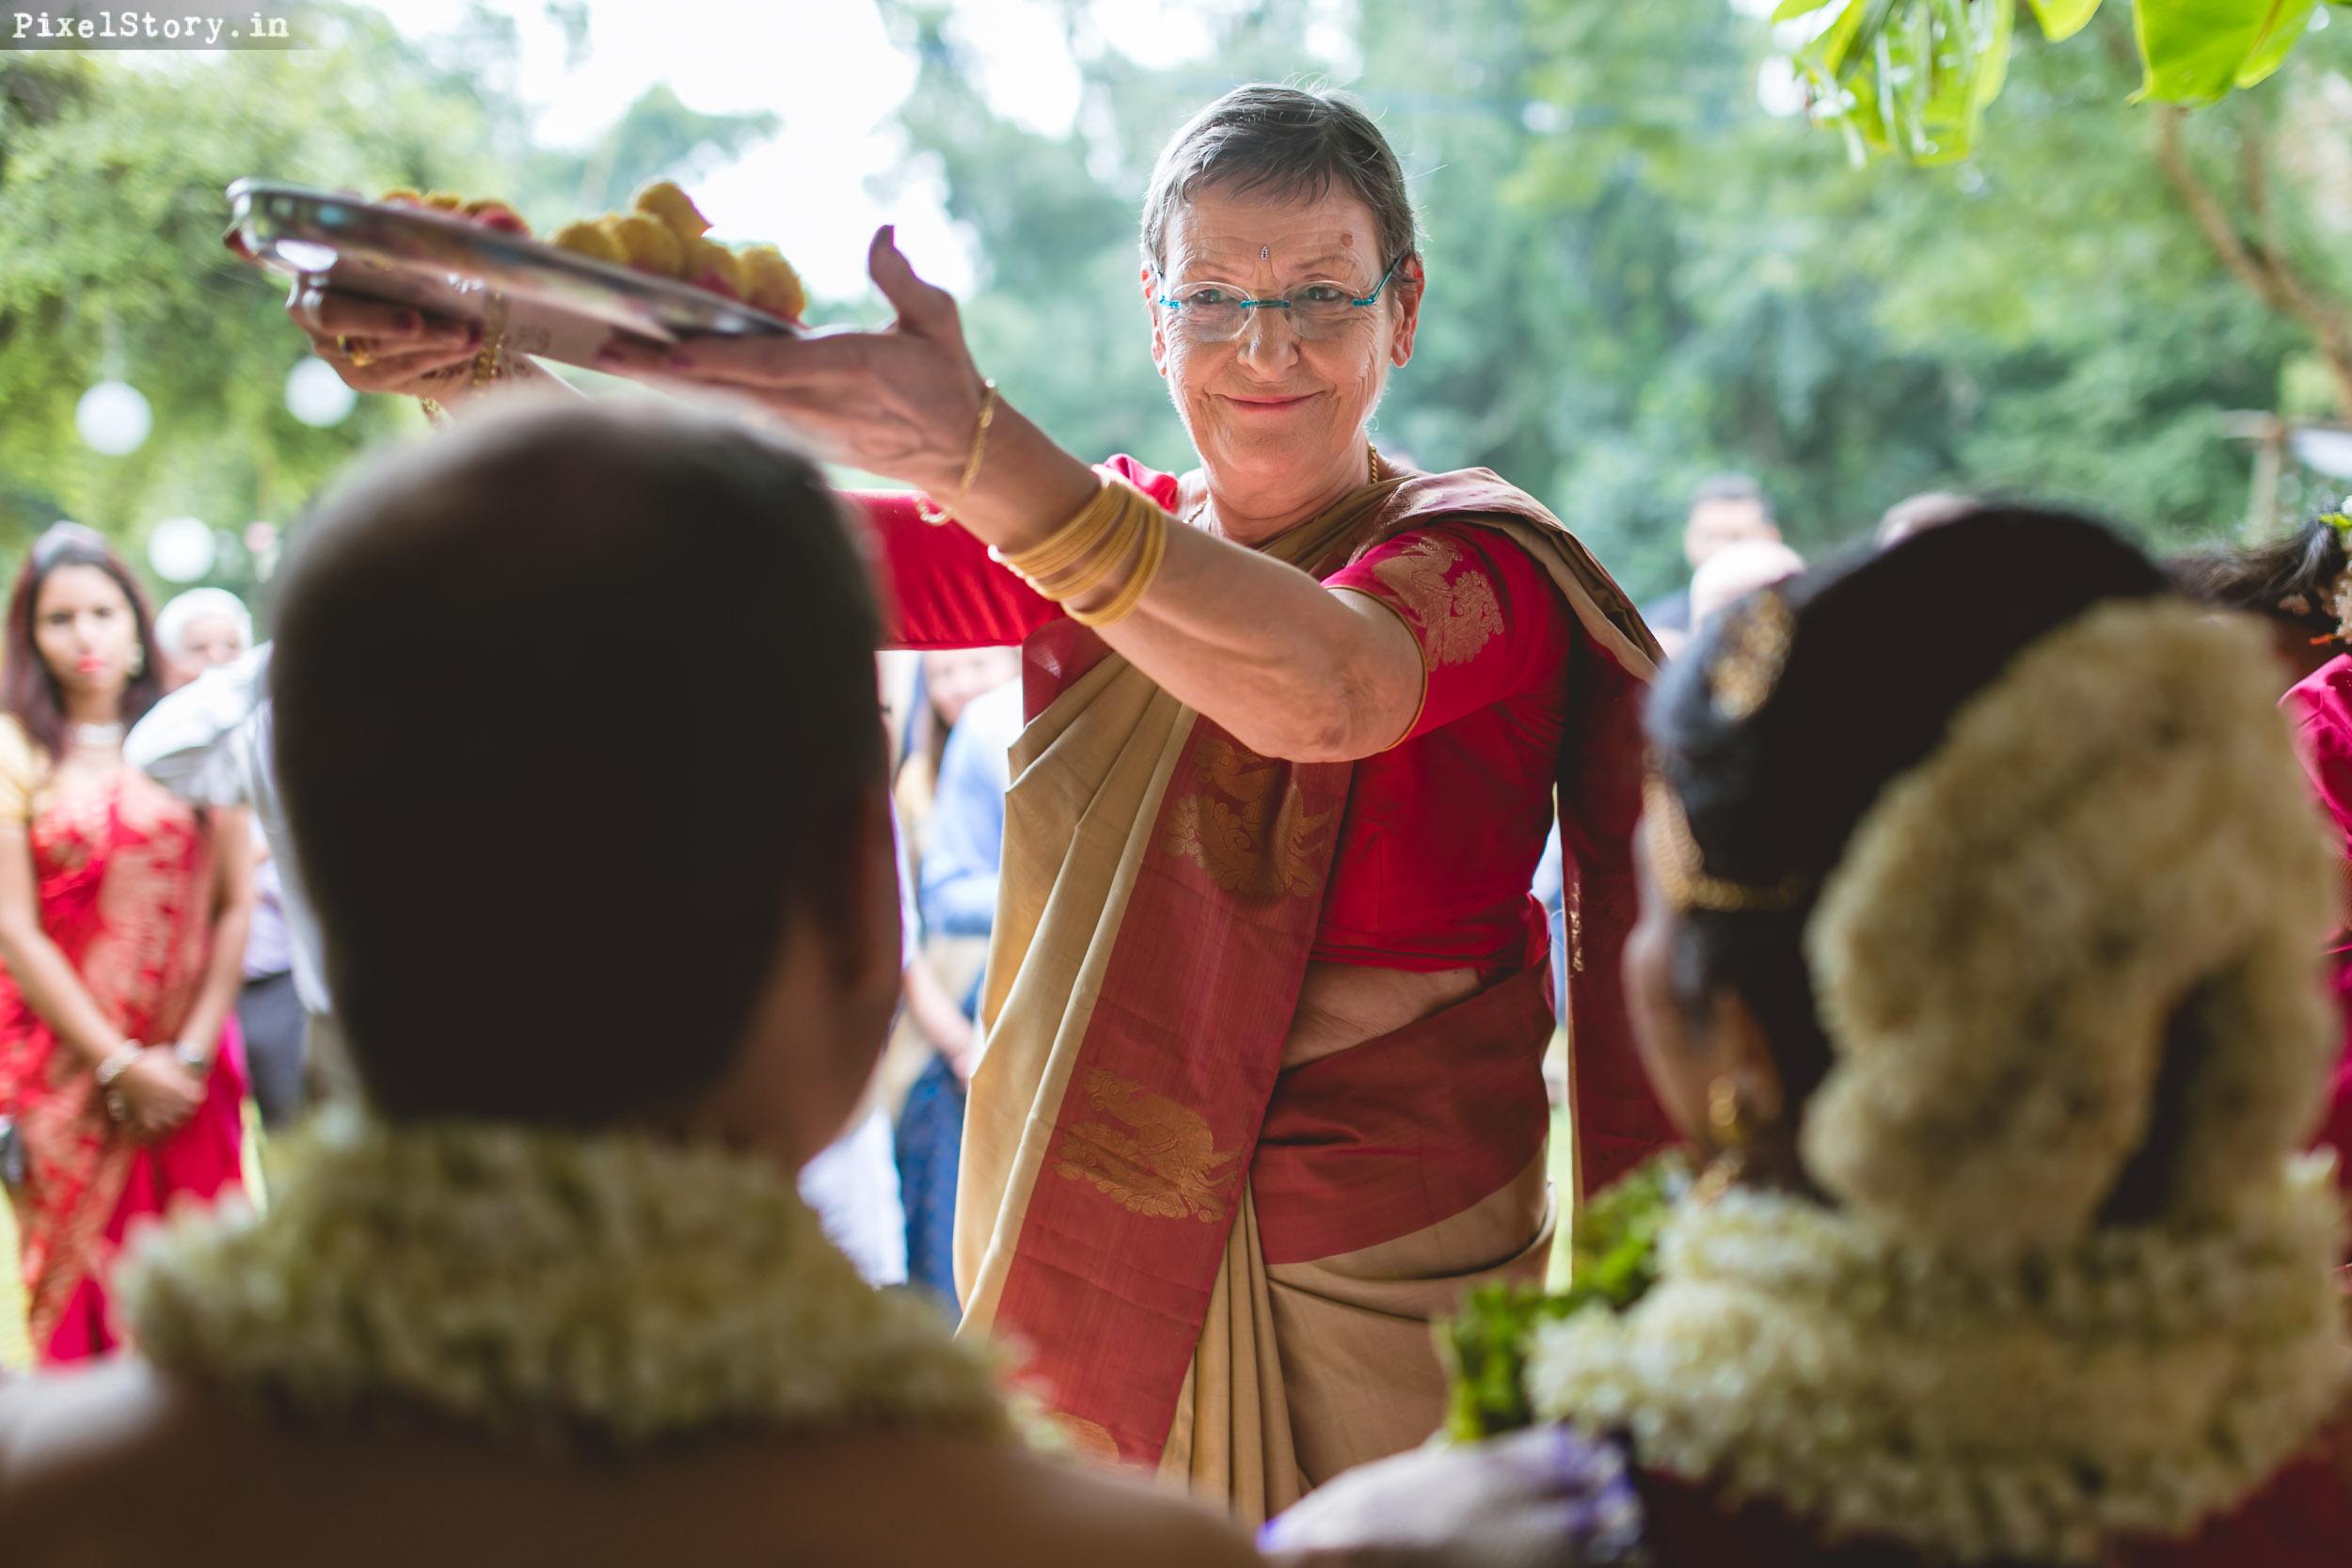 PixelStory-Jungle-Wedding-Photographer-Masinagudi-Indo-French043.jpg